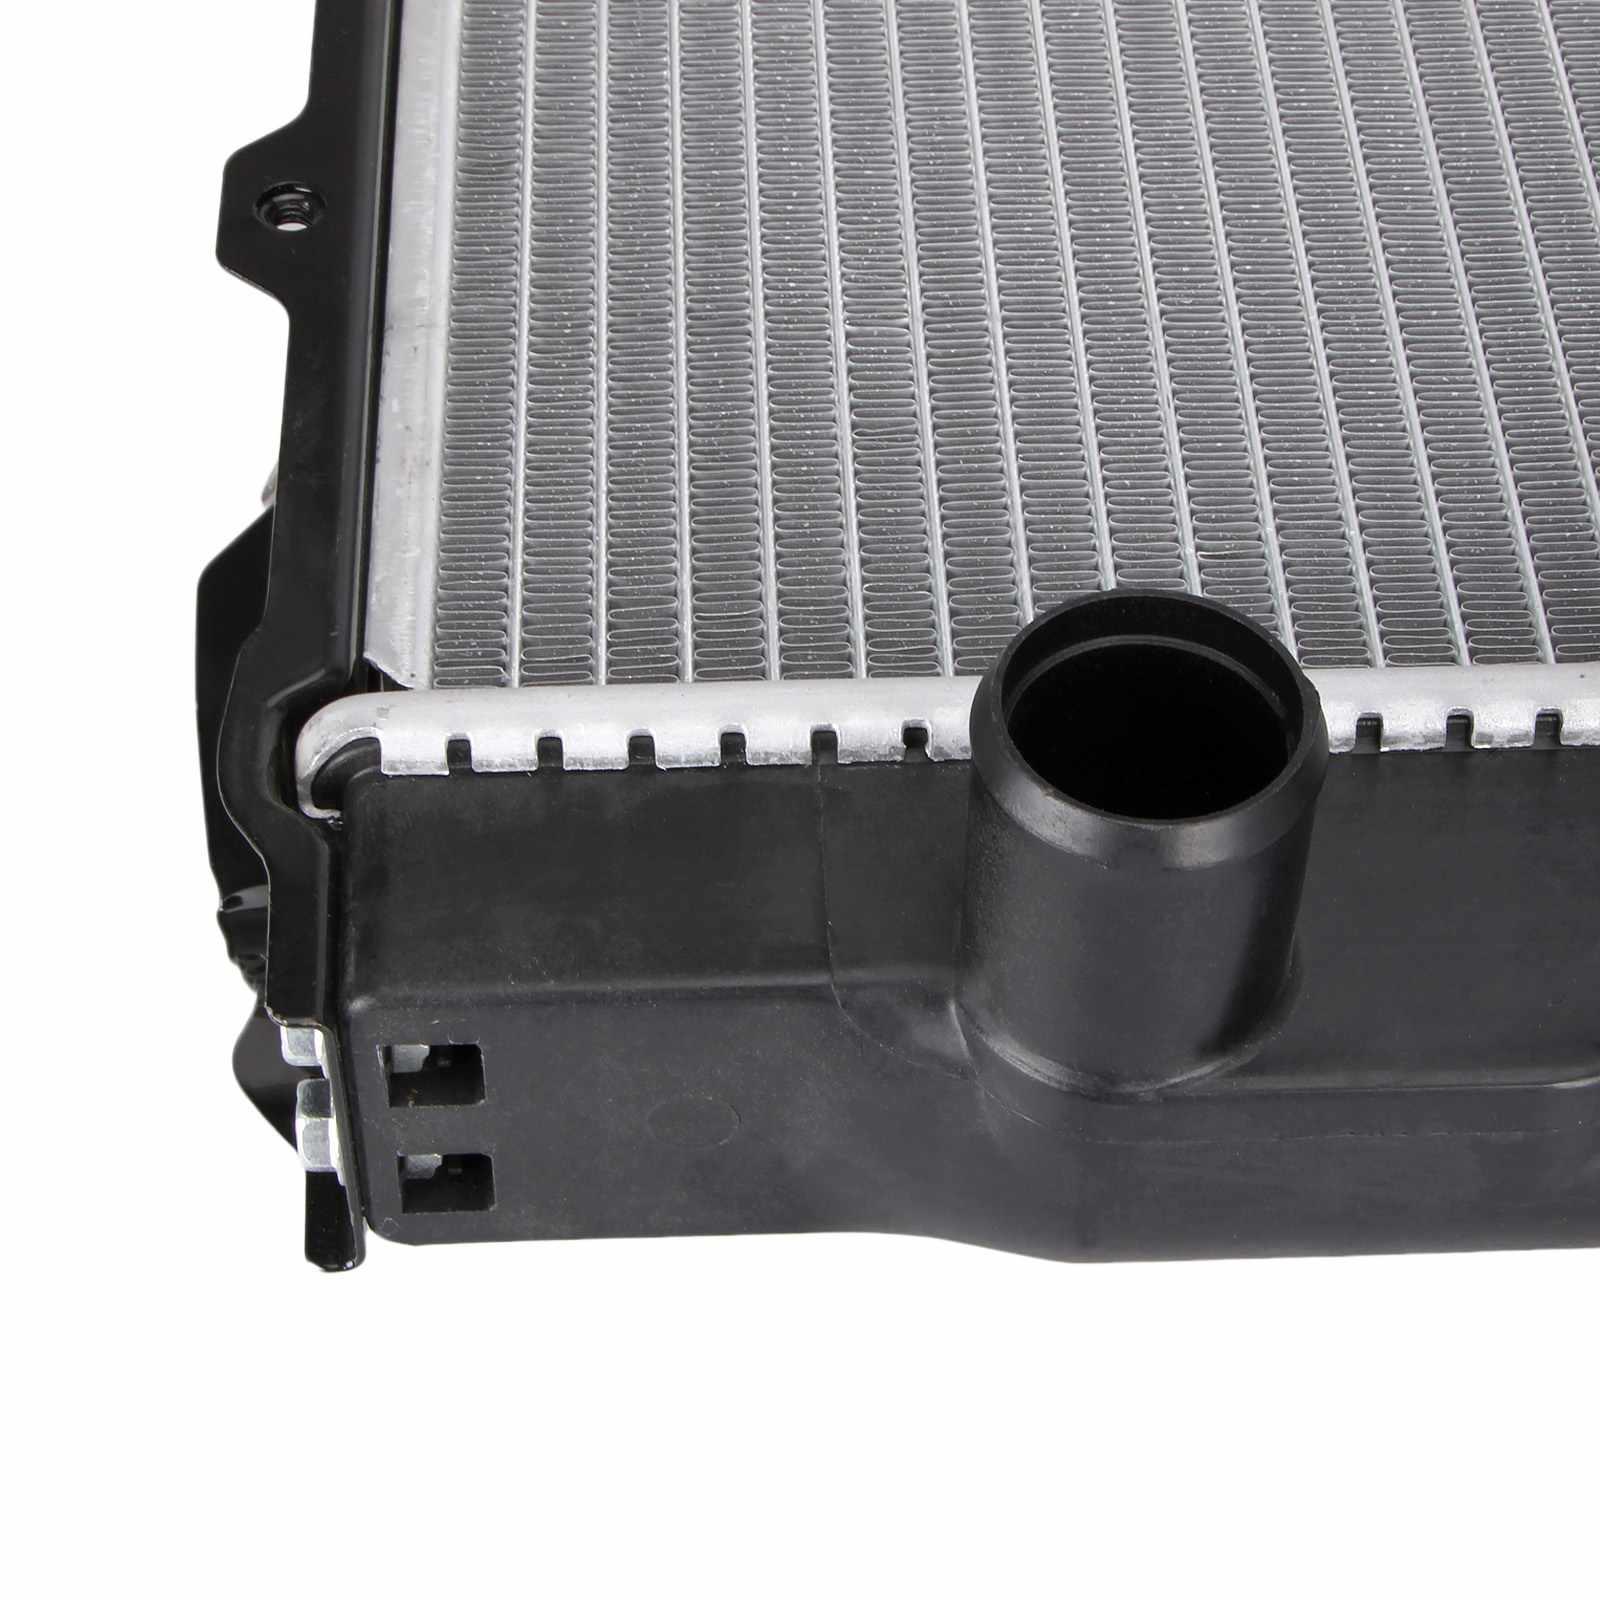 Dromedary Brand 33l toyota radiator v6 factory